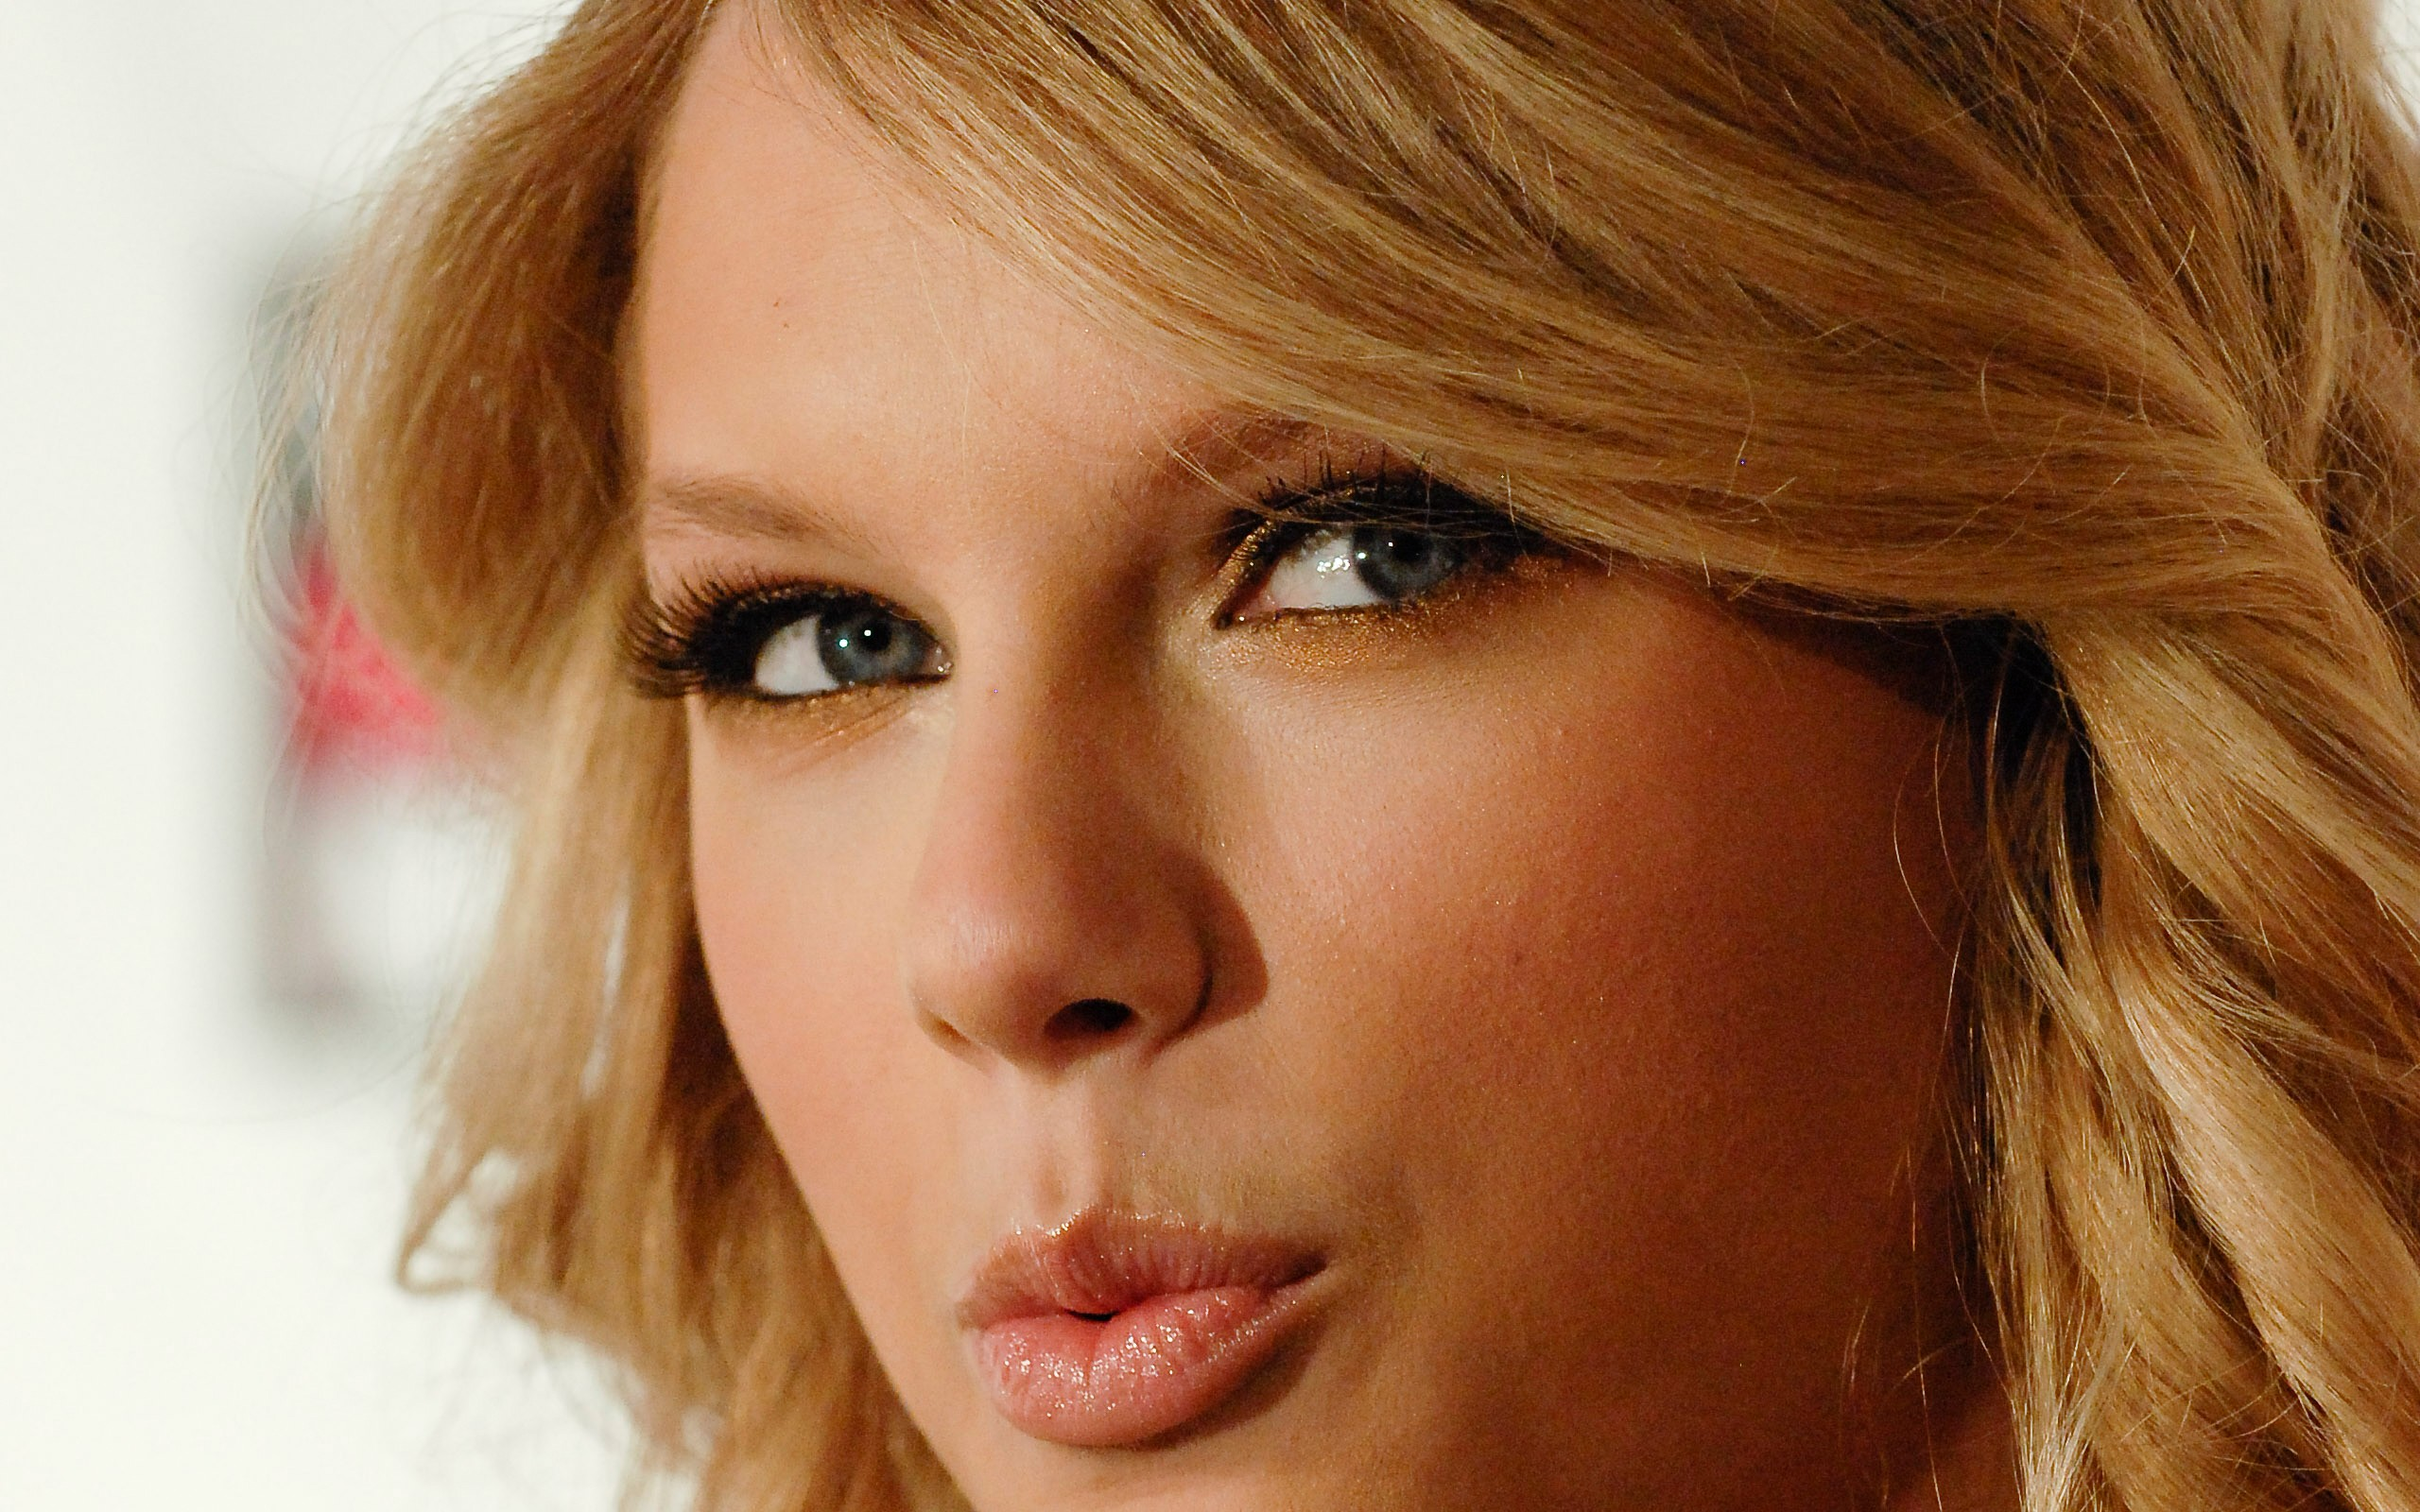 blondes women closeup blue eyes taylor swift long hair